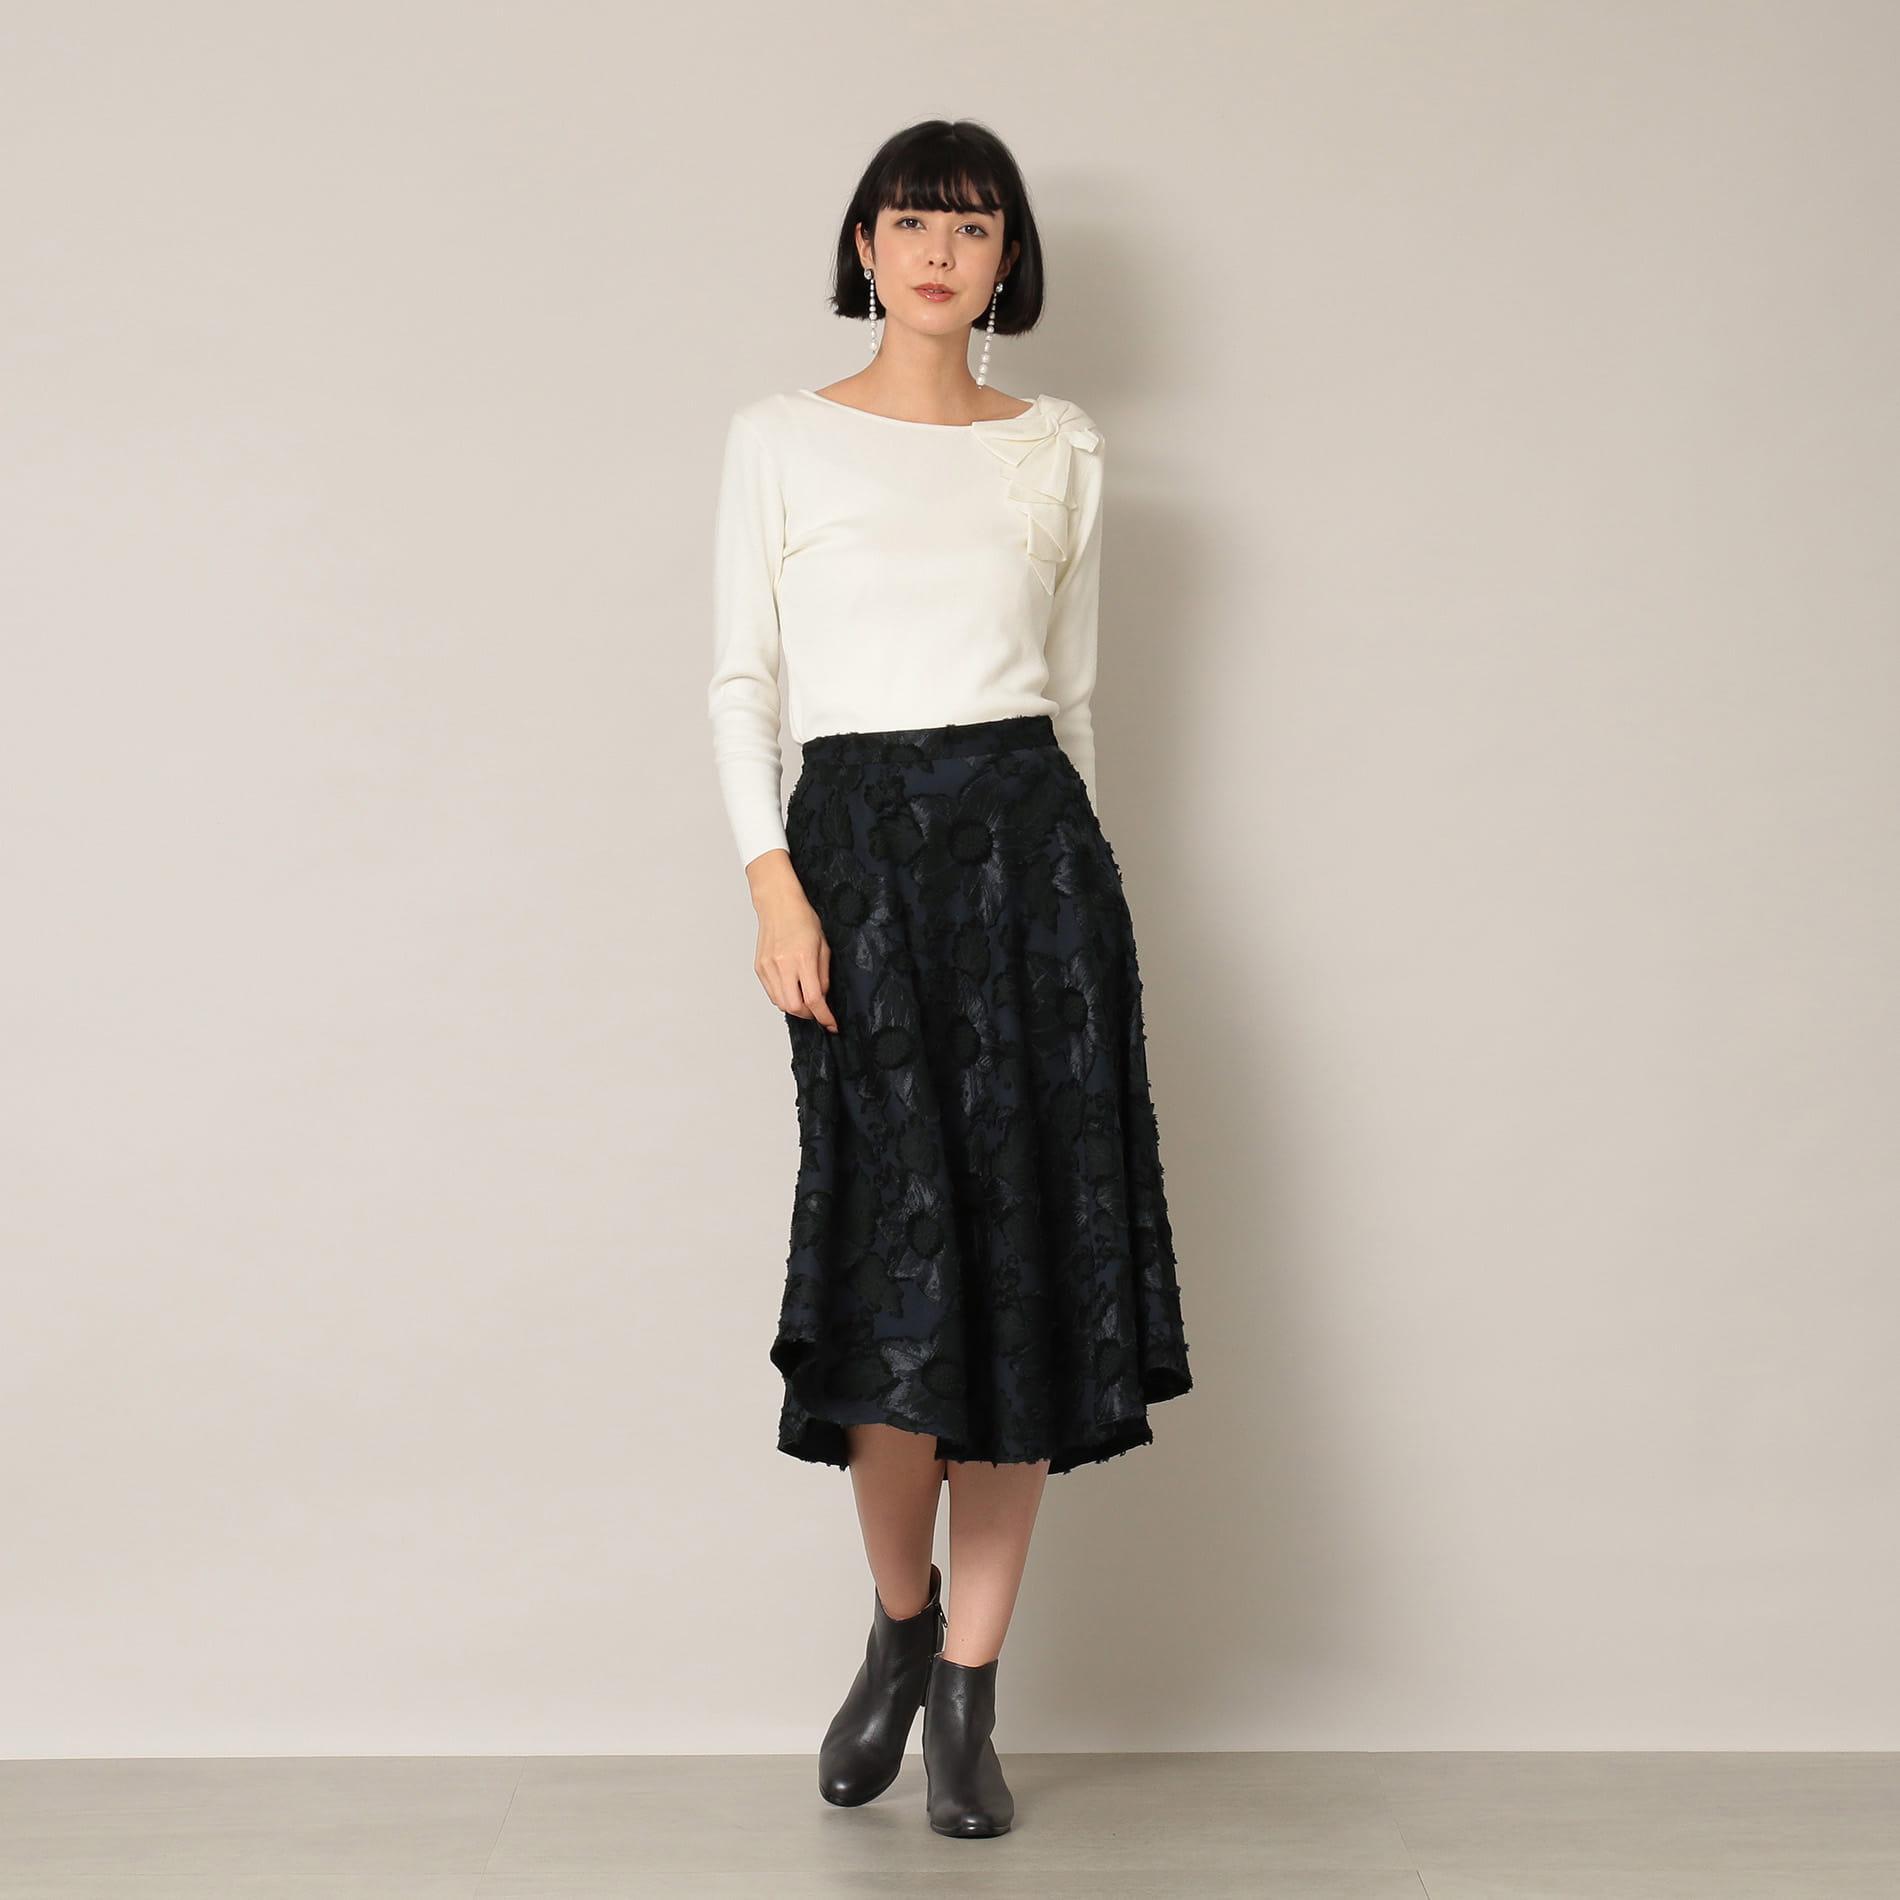 【EPOCA THE SHOP】クリスマスローズジャカードスカート